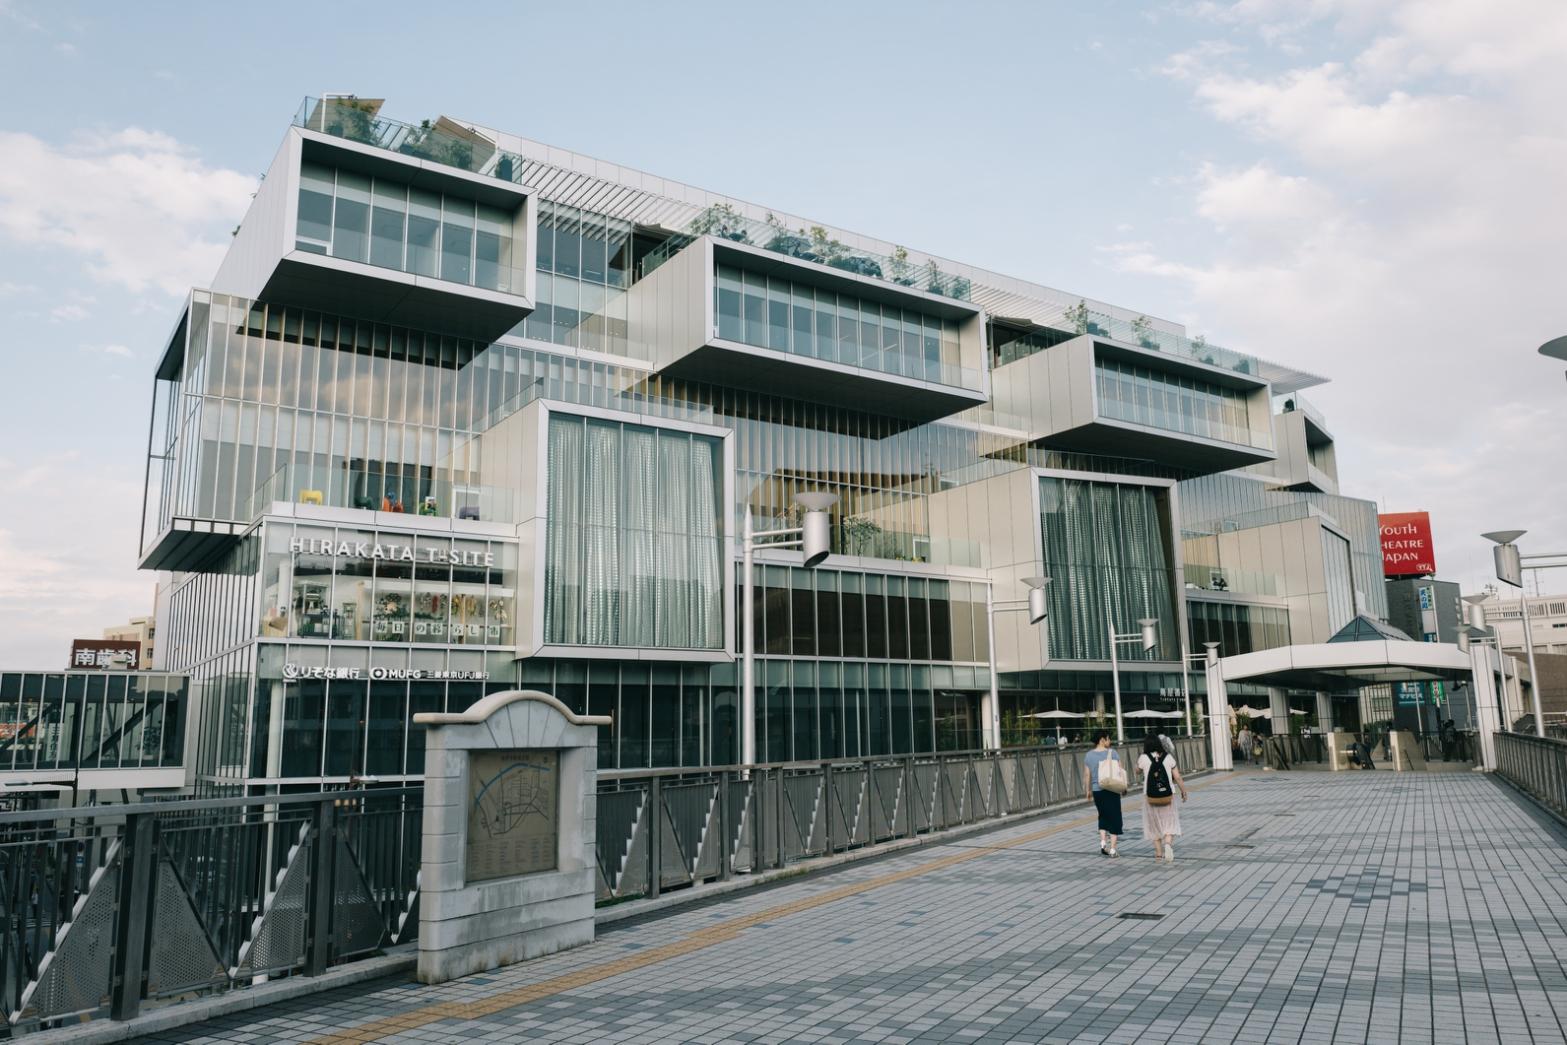 T-SITE大阪枚方店現場解析,增田社長親手打造的故鄉旗艦店